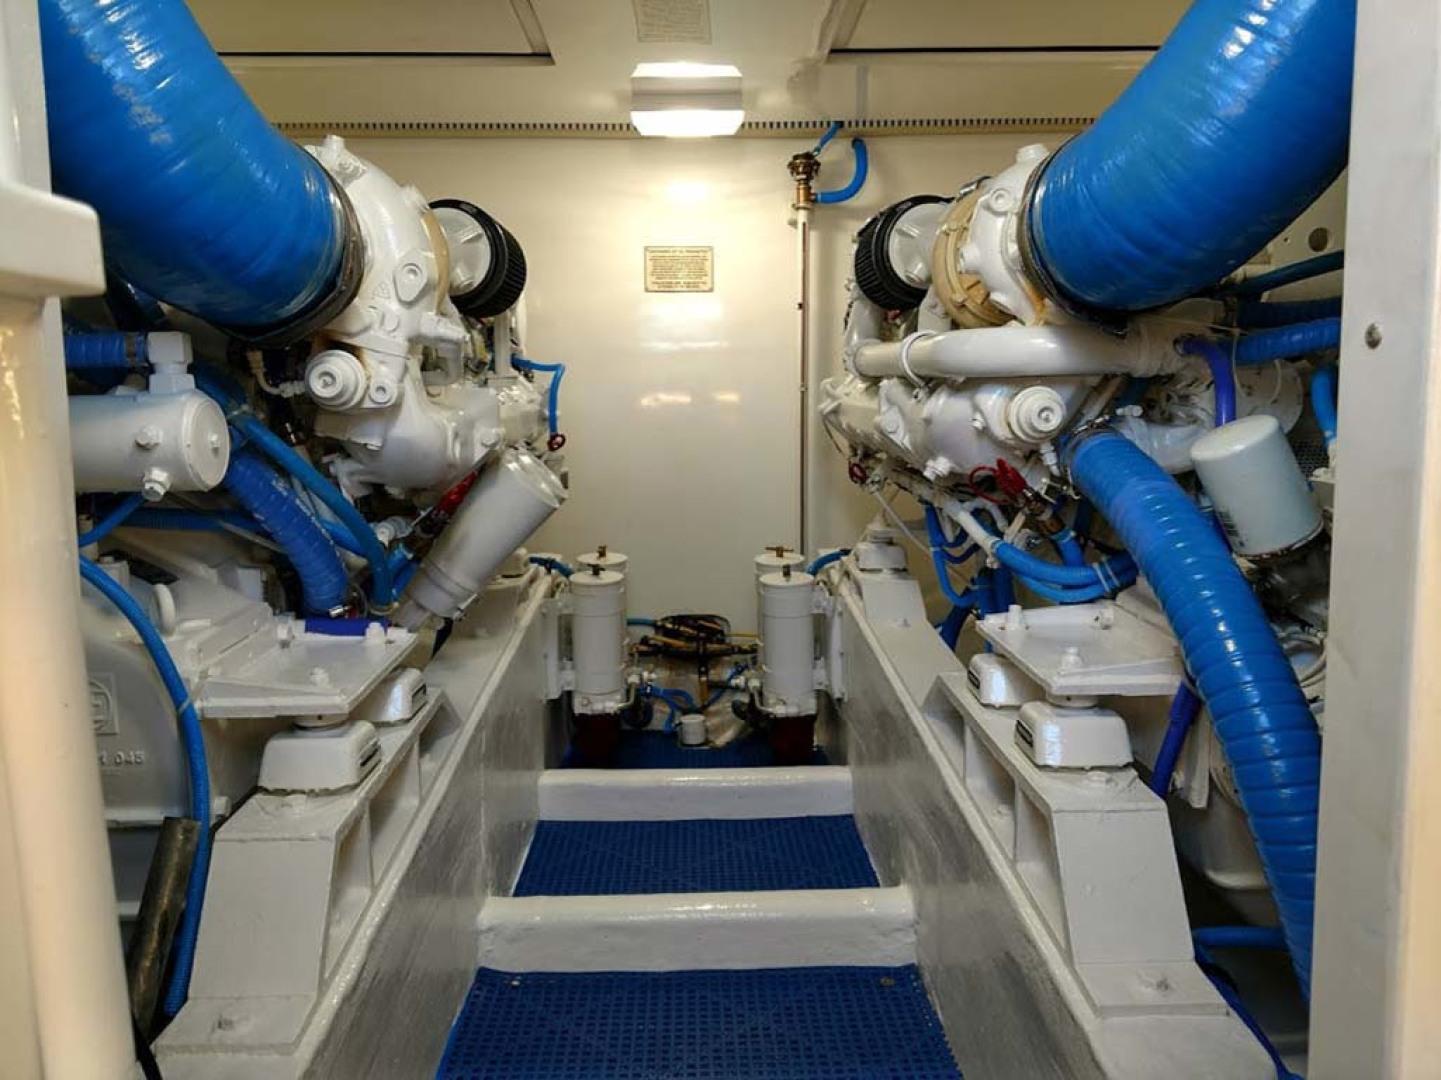 Bertram-510 Convertible 2002-Mary B Oceans Edge Hotel and Marina, Key West-Florida-United States-Engine Room-1163319 | Thumbnail